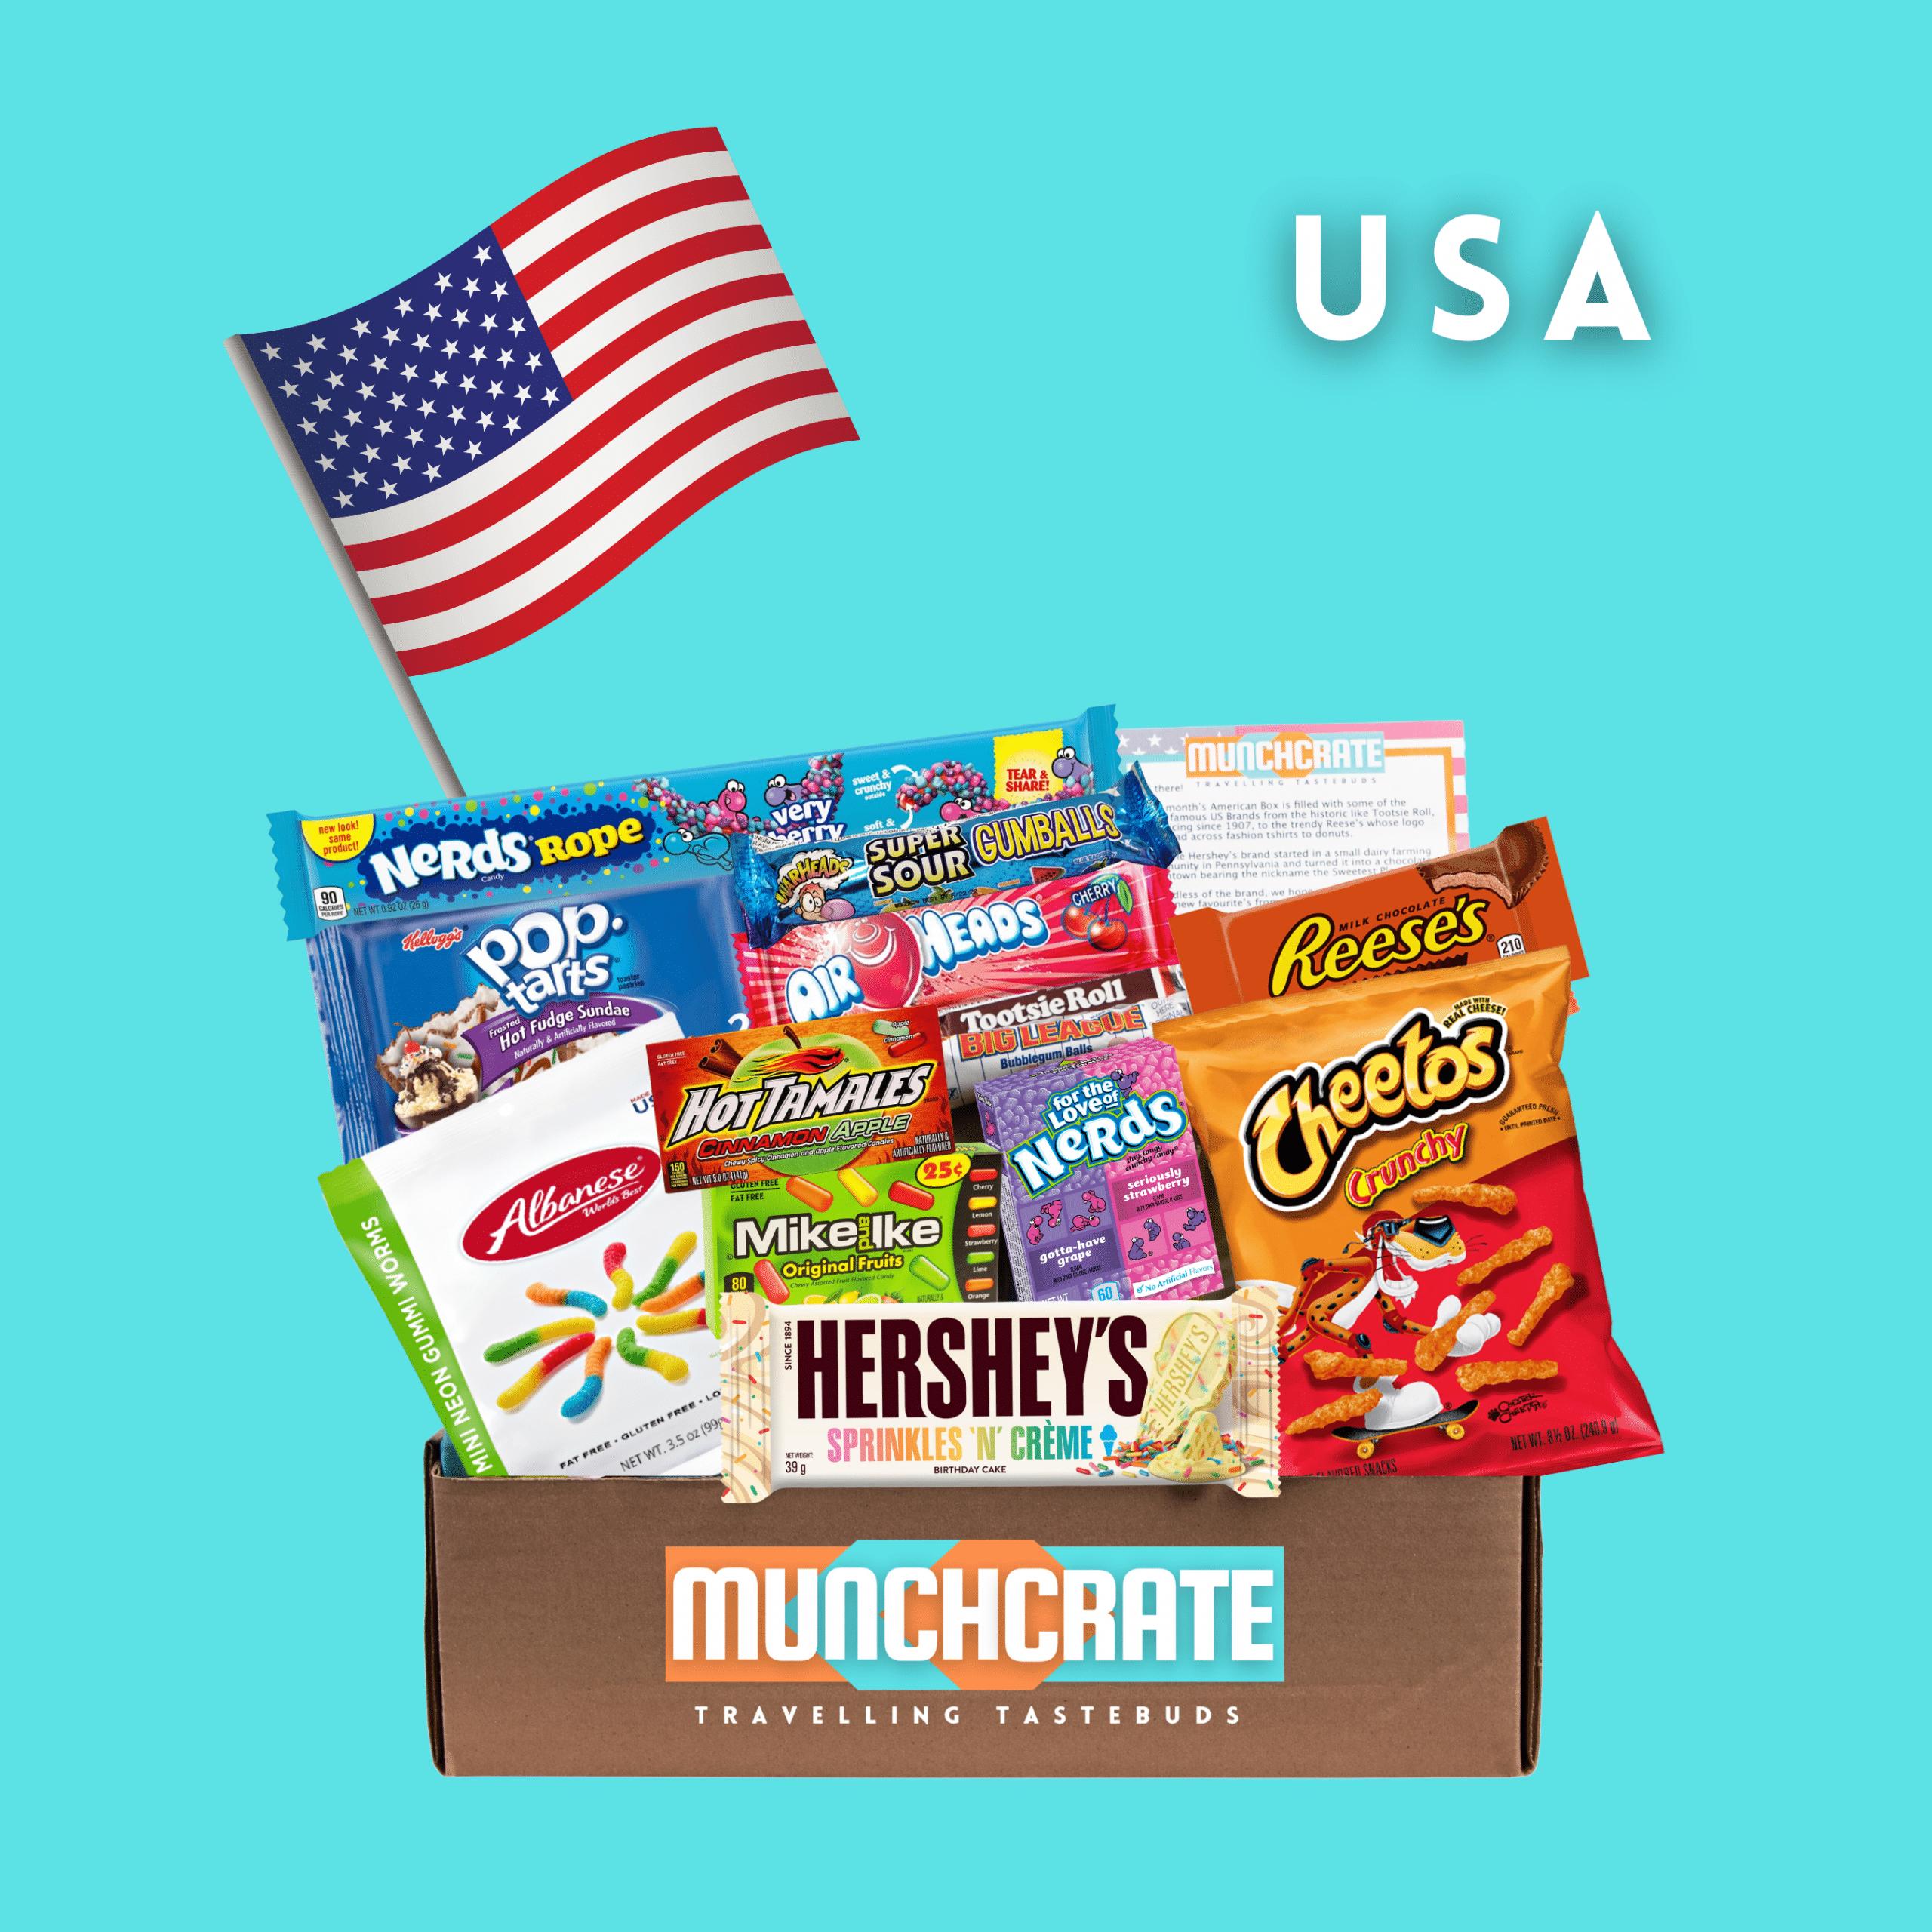 Munch Crate USA